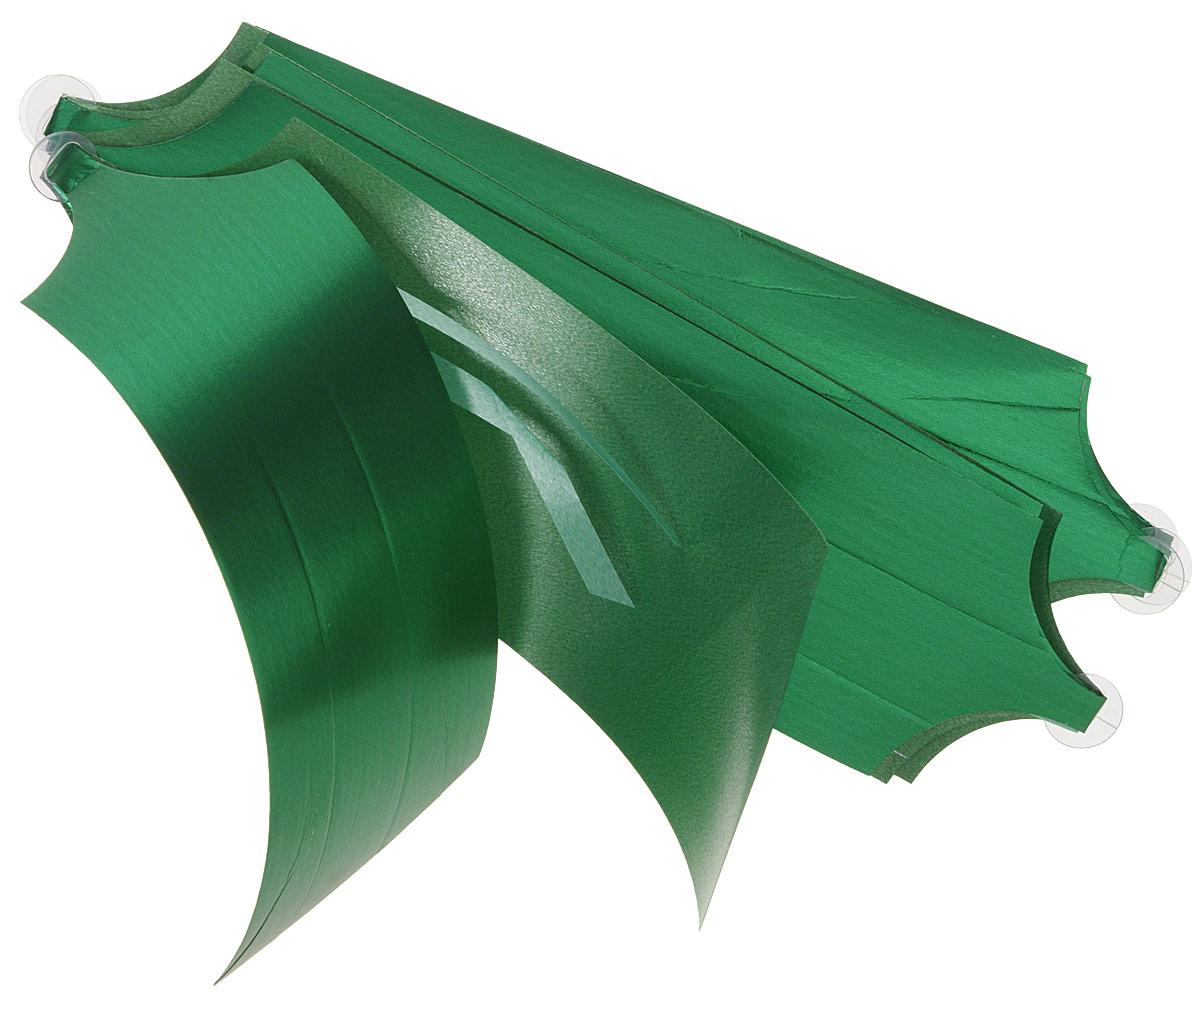 Бант упаковочный Veld-Co Шар, цвет: зеленый, 5 х 148 см, 10 шт бант упаковочный veld co шар цвет розовый 5 х 148 см 10 шт